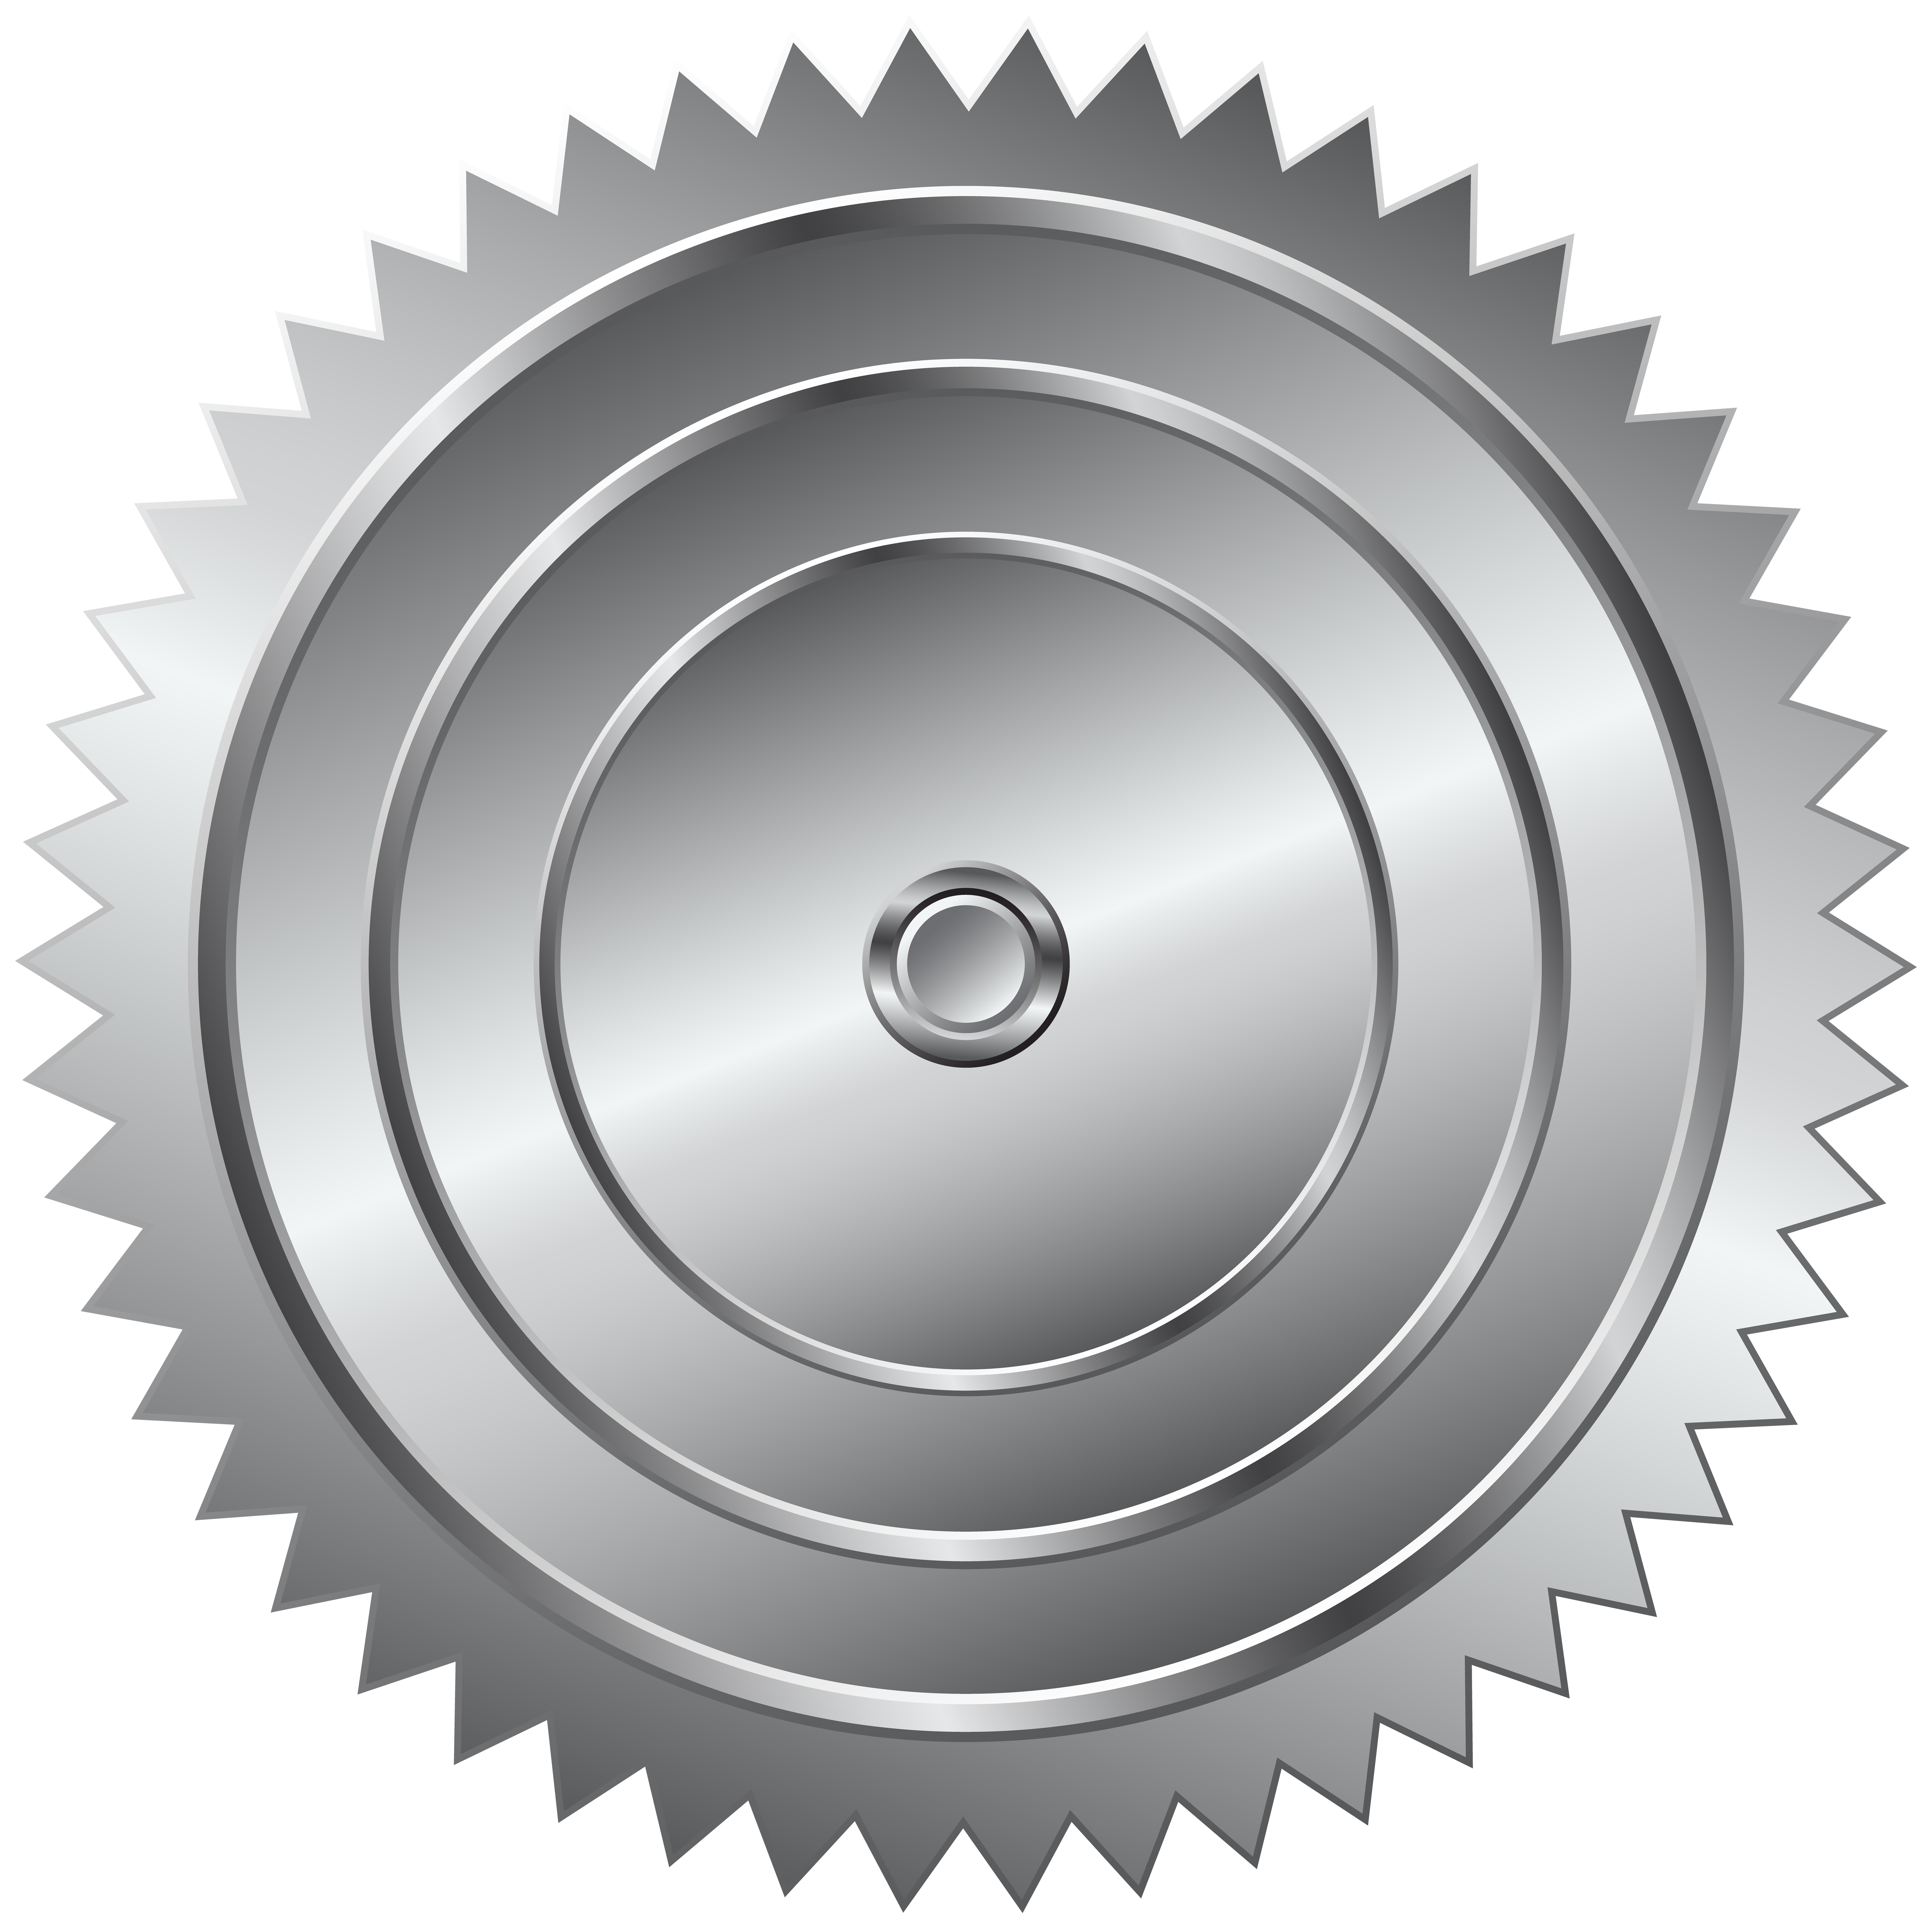 Piano clipart tool. Gear silver clip art